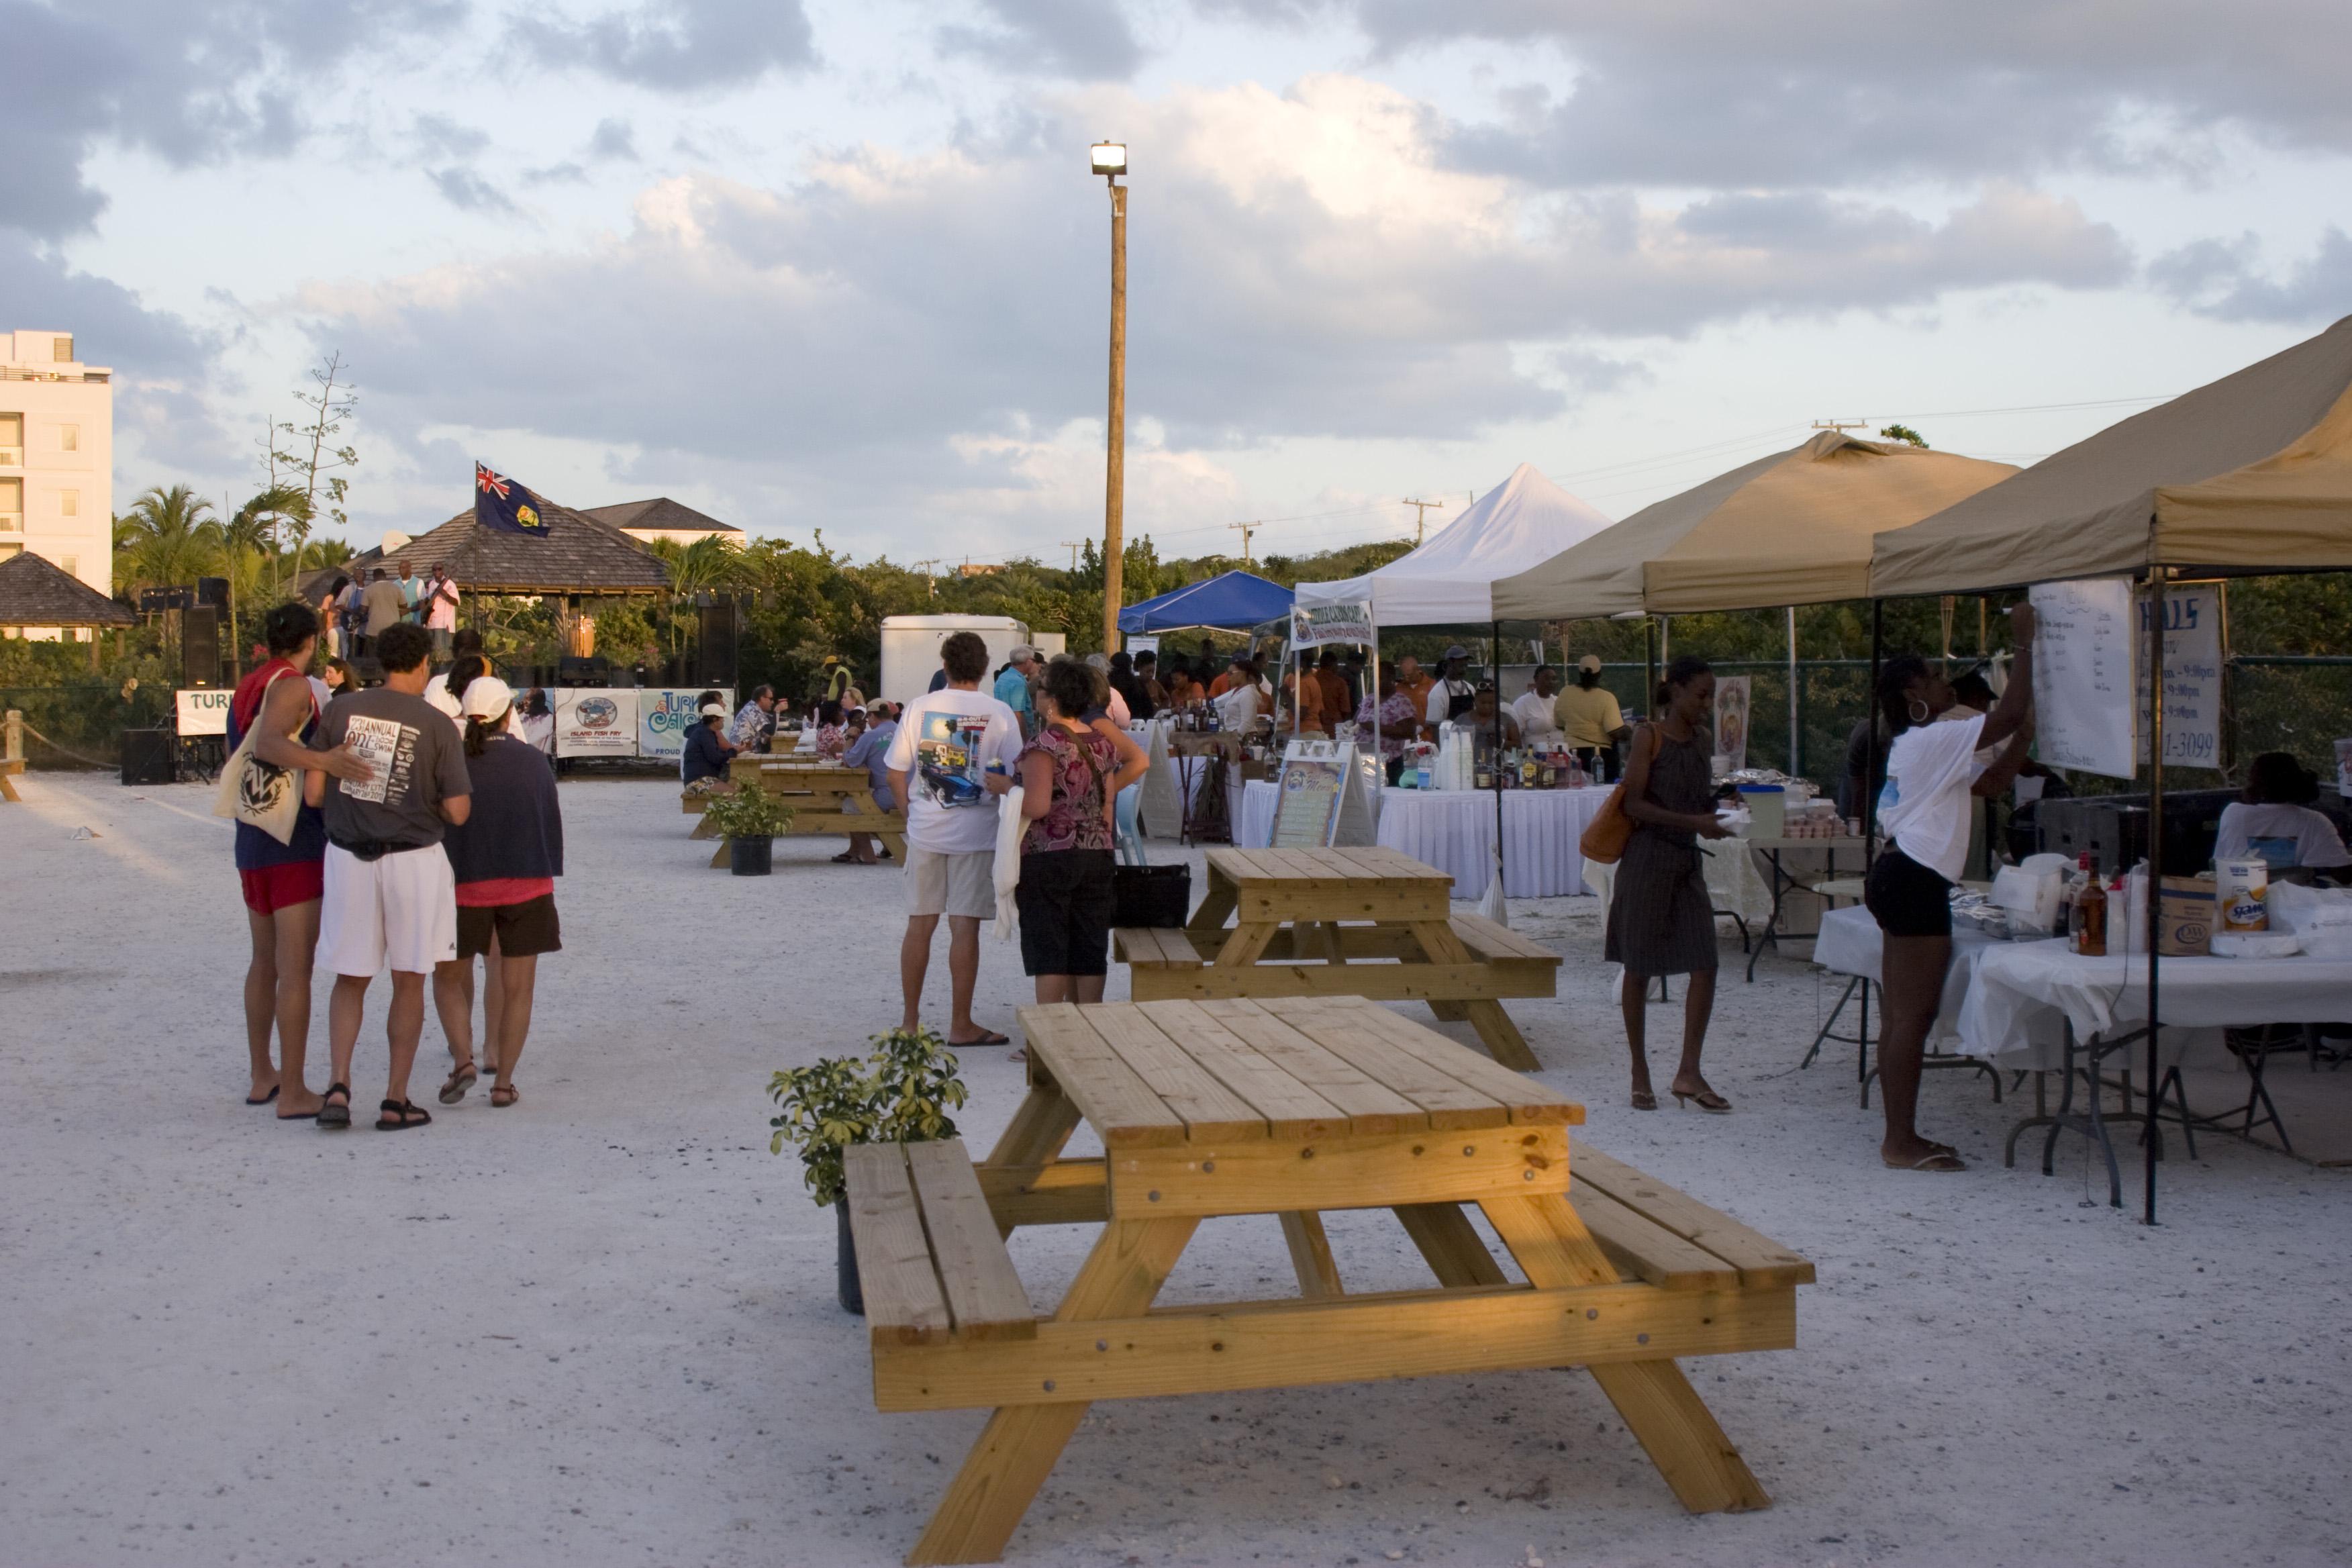 Fish Fry Bridges Tourist/local Gap On Turks And Caicos | CNN Travel